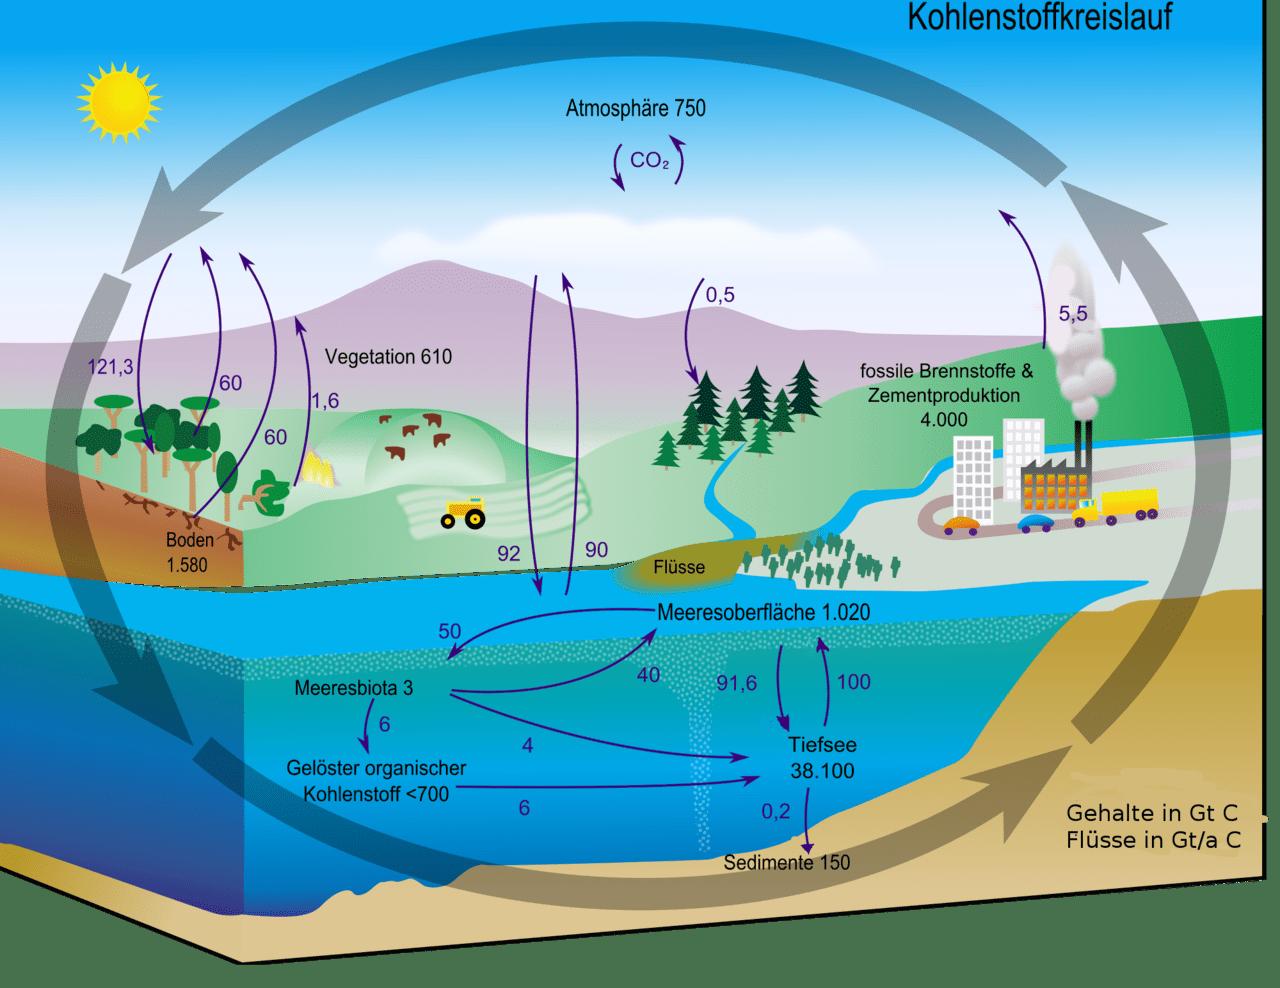 hydrosphere lithosphere atmosphere diagram obd0 to obd2 alternator wiring original file  2 000 1 544 pixels size 667 kb